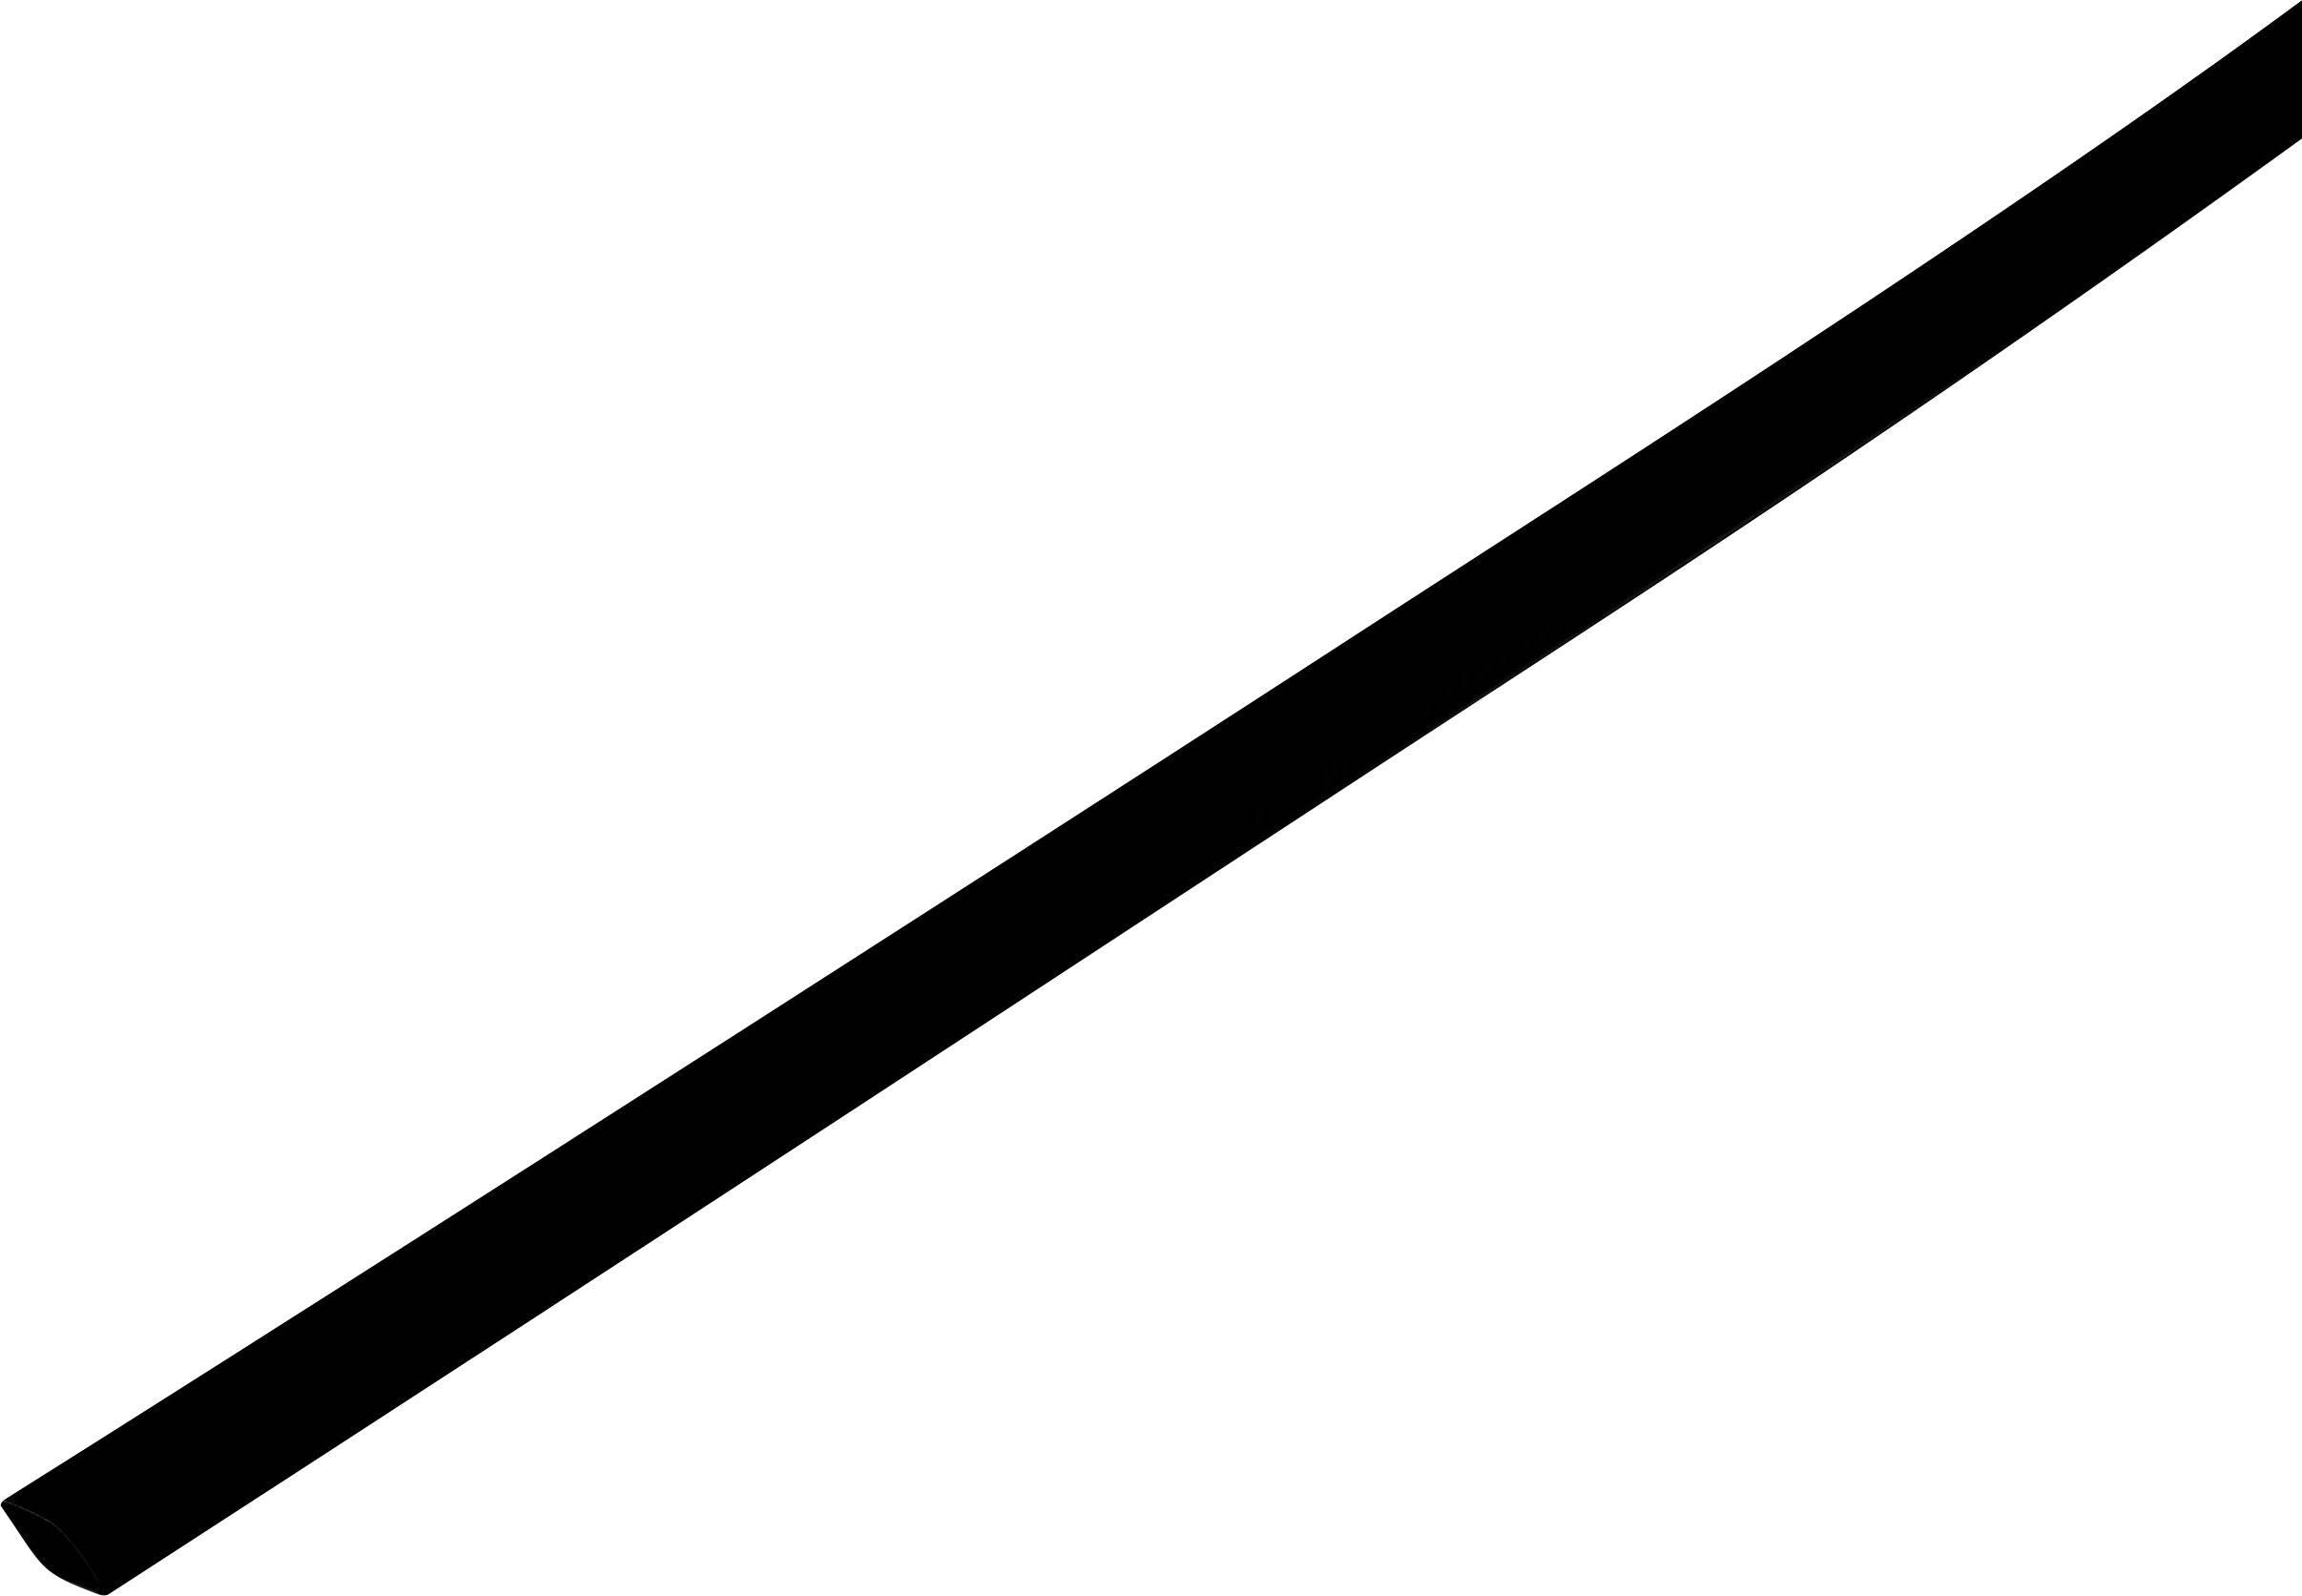 черная полоса картинка без фона